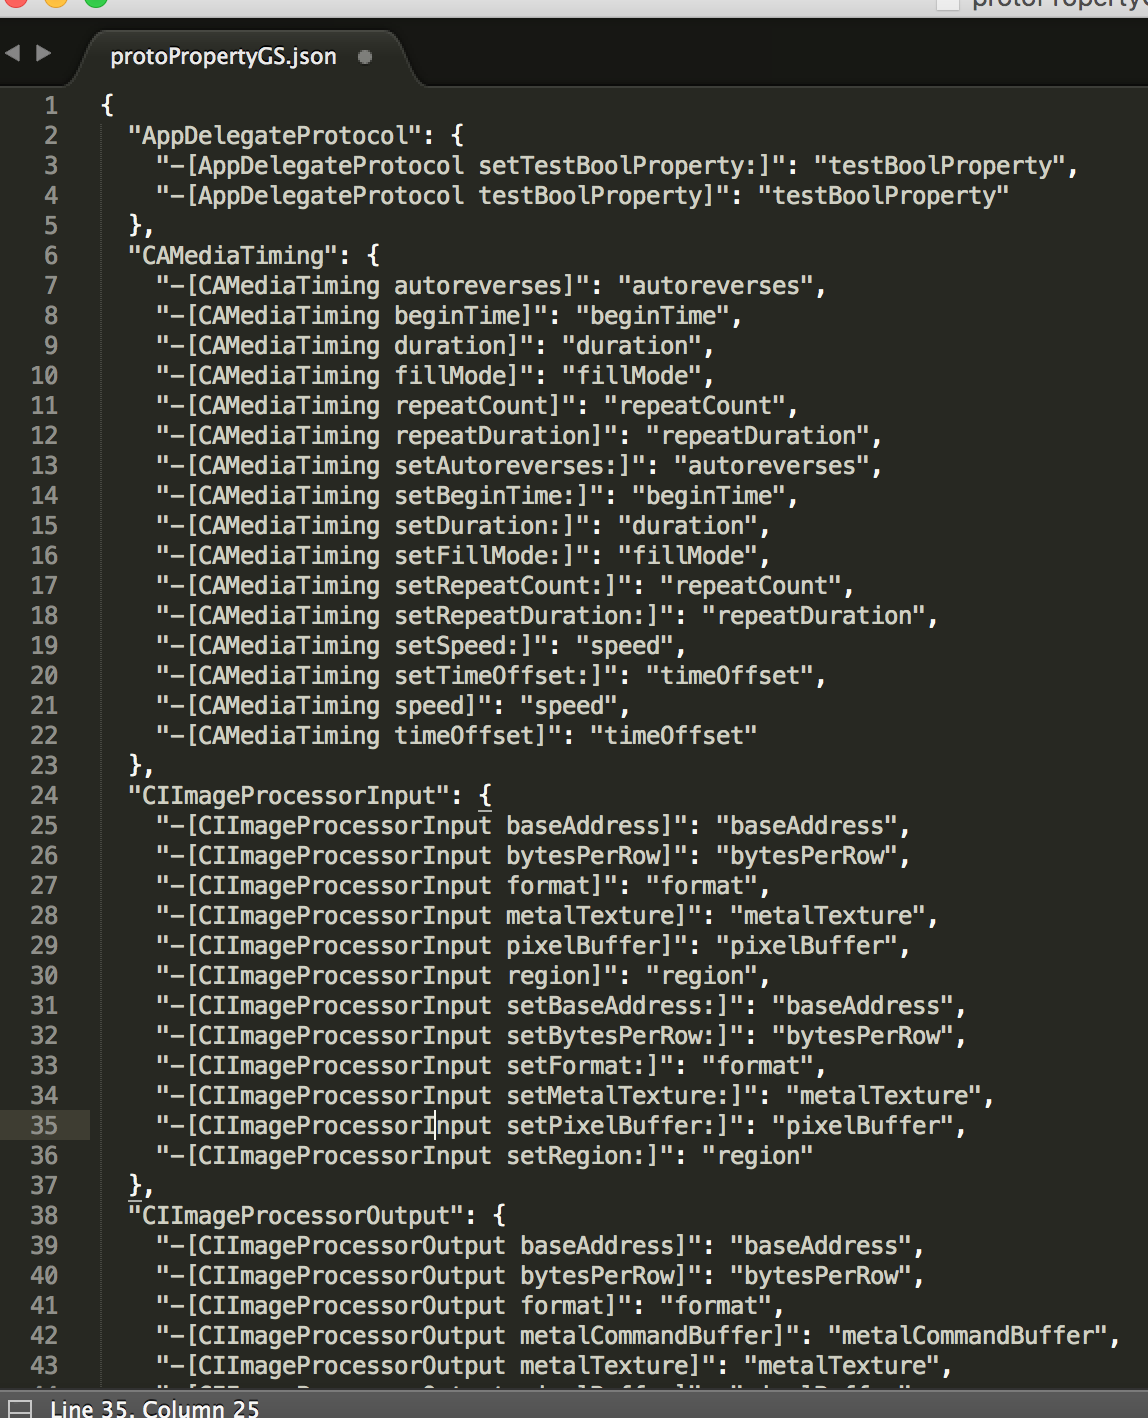 clang-validate-ios-api-protoPropertyGS